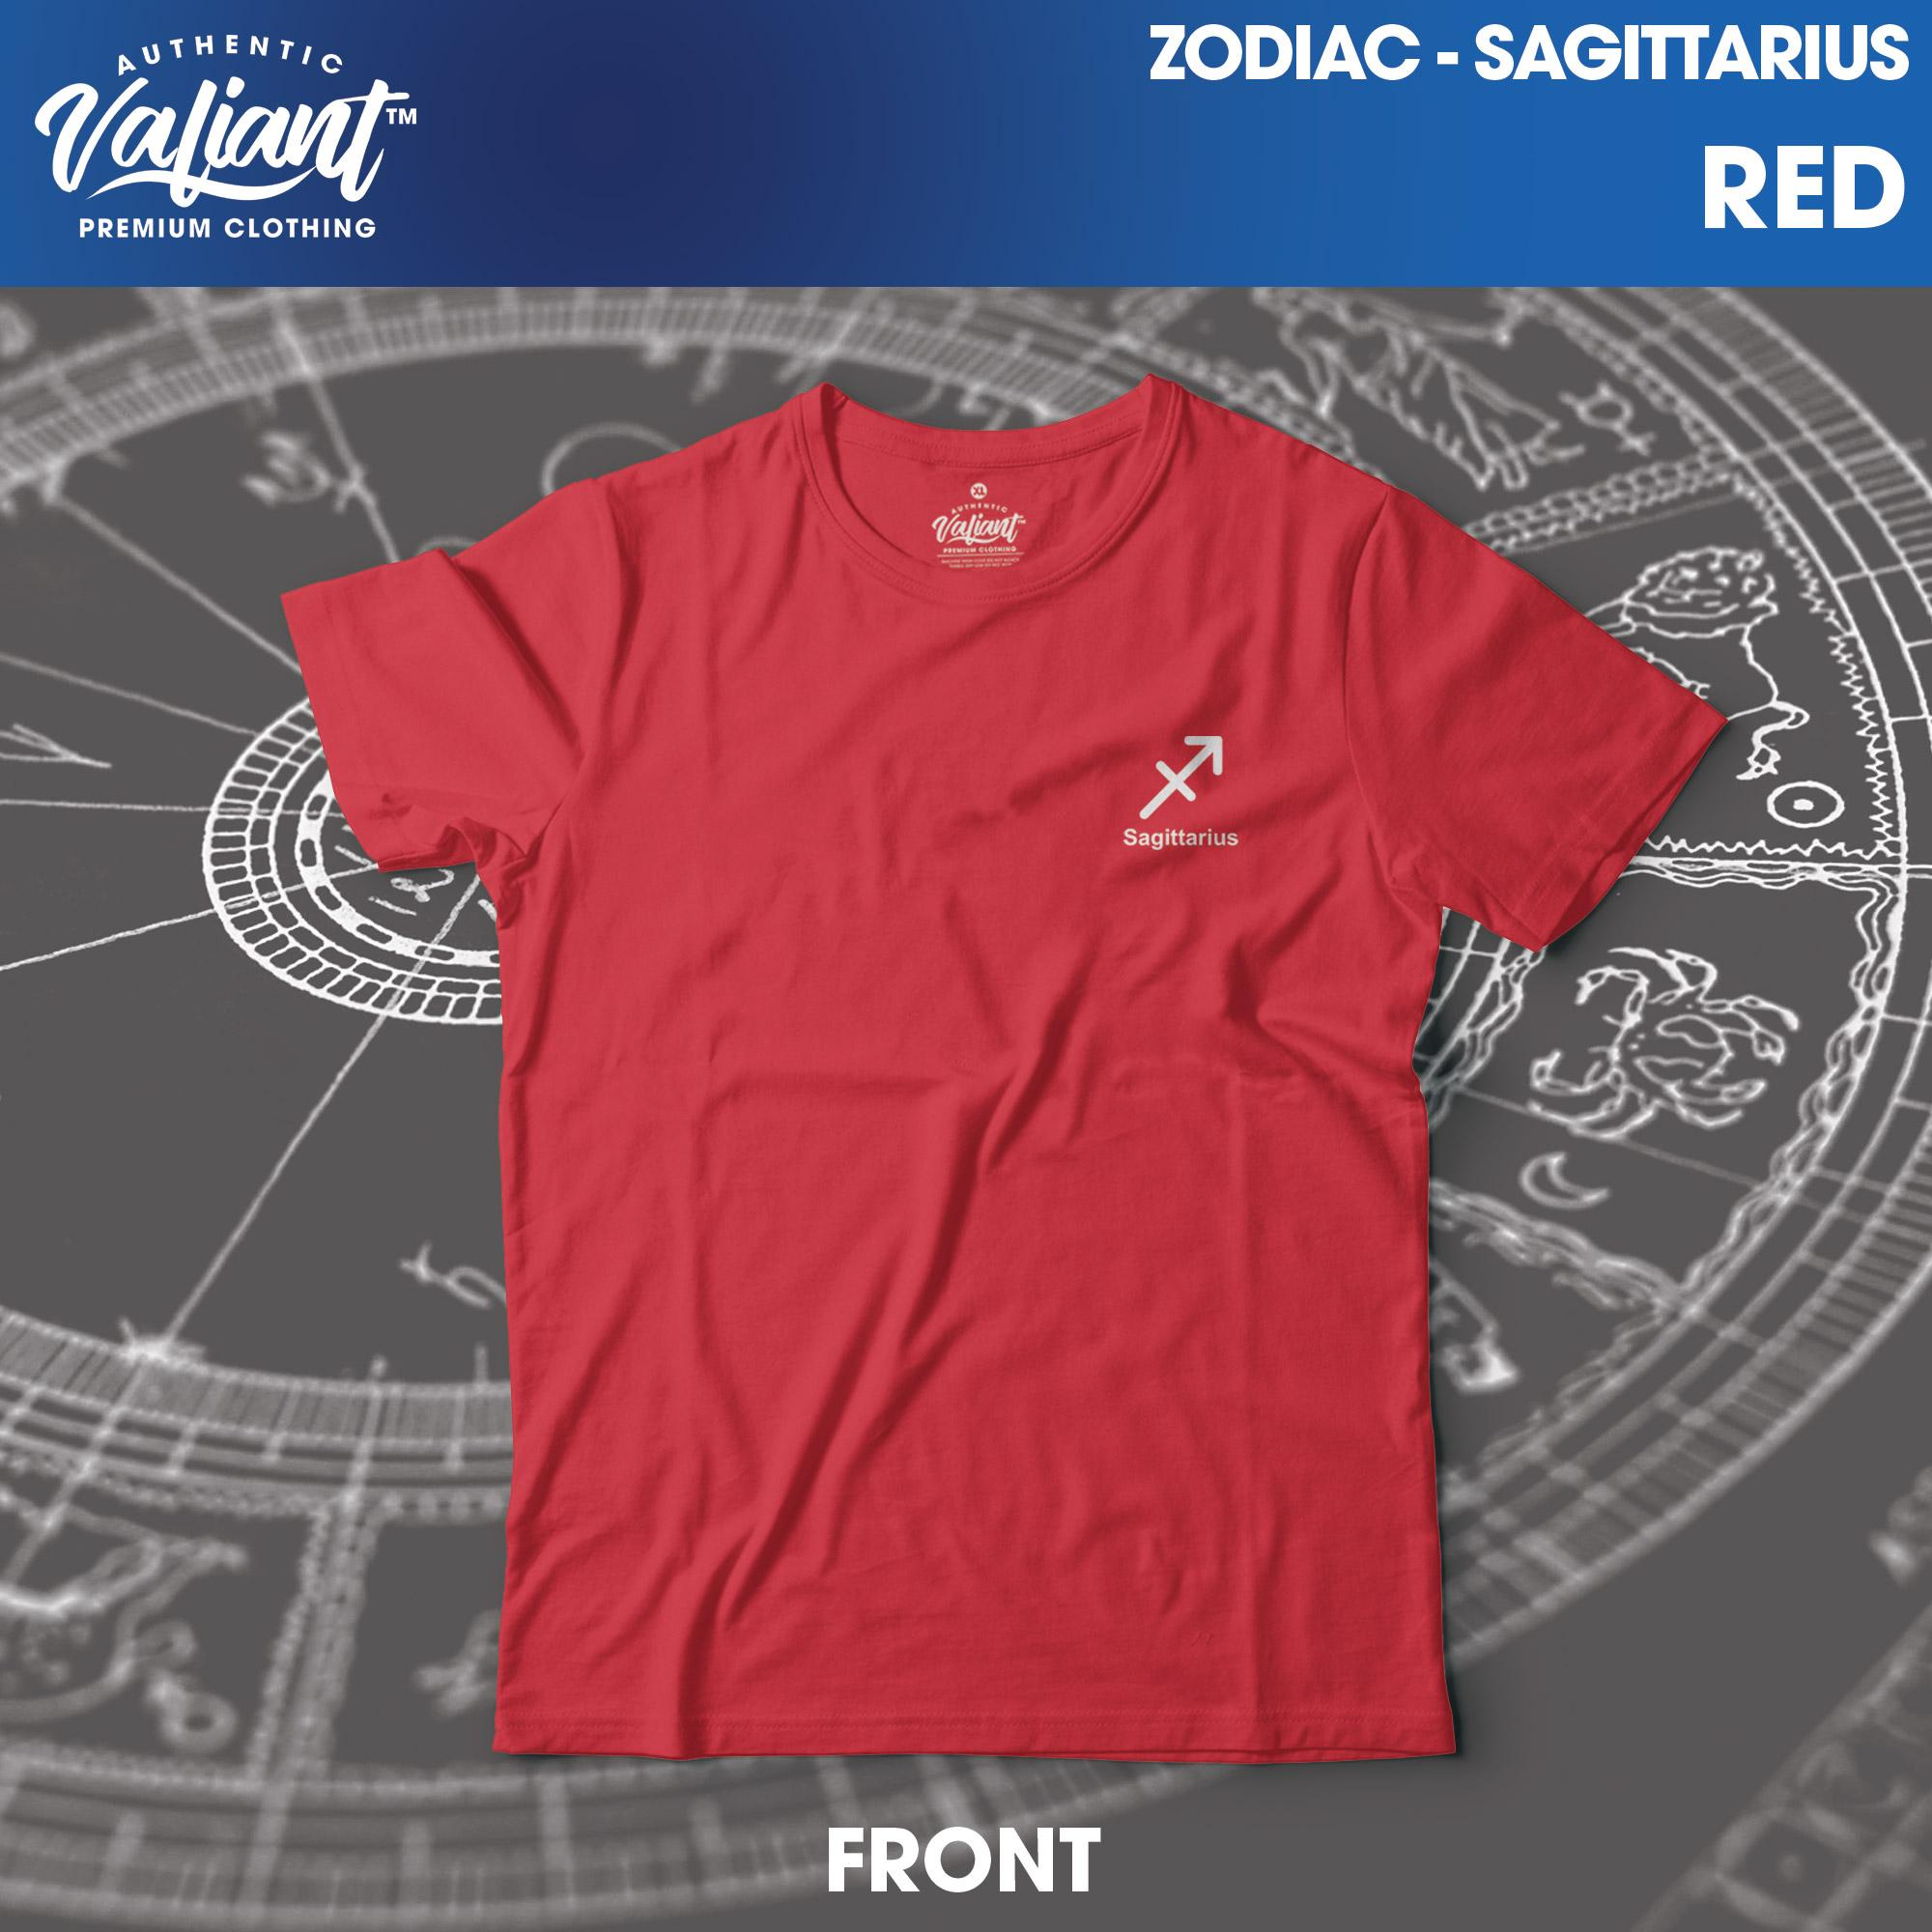 35b0f947936f Product details of Zodiac Sign Shirt (Sagittarius) - Valiant Premium  Clothing